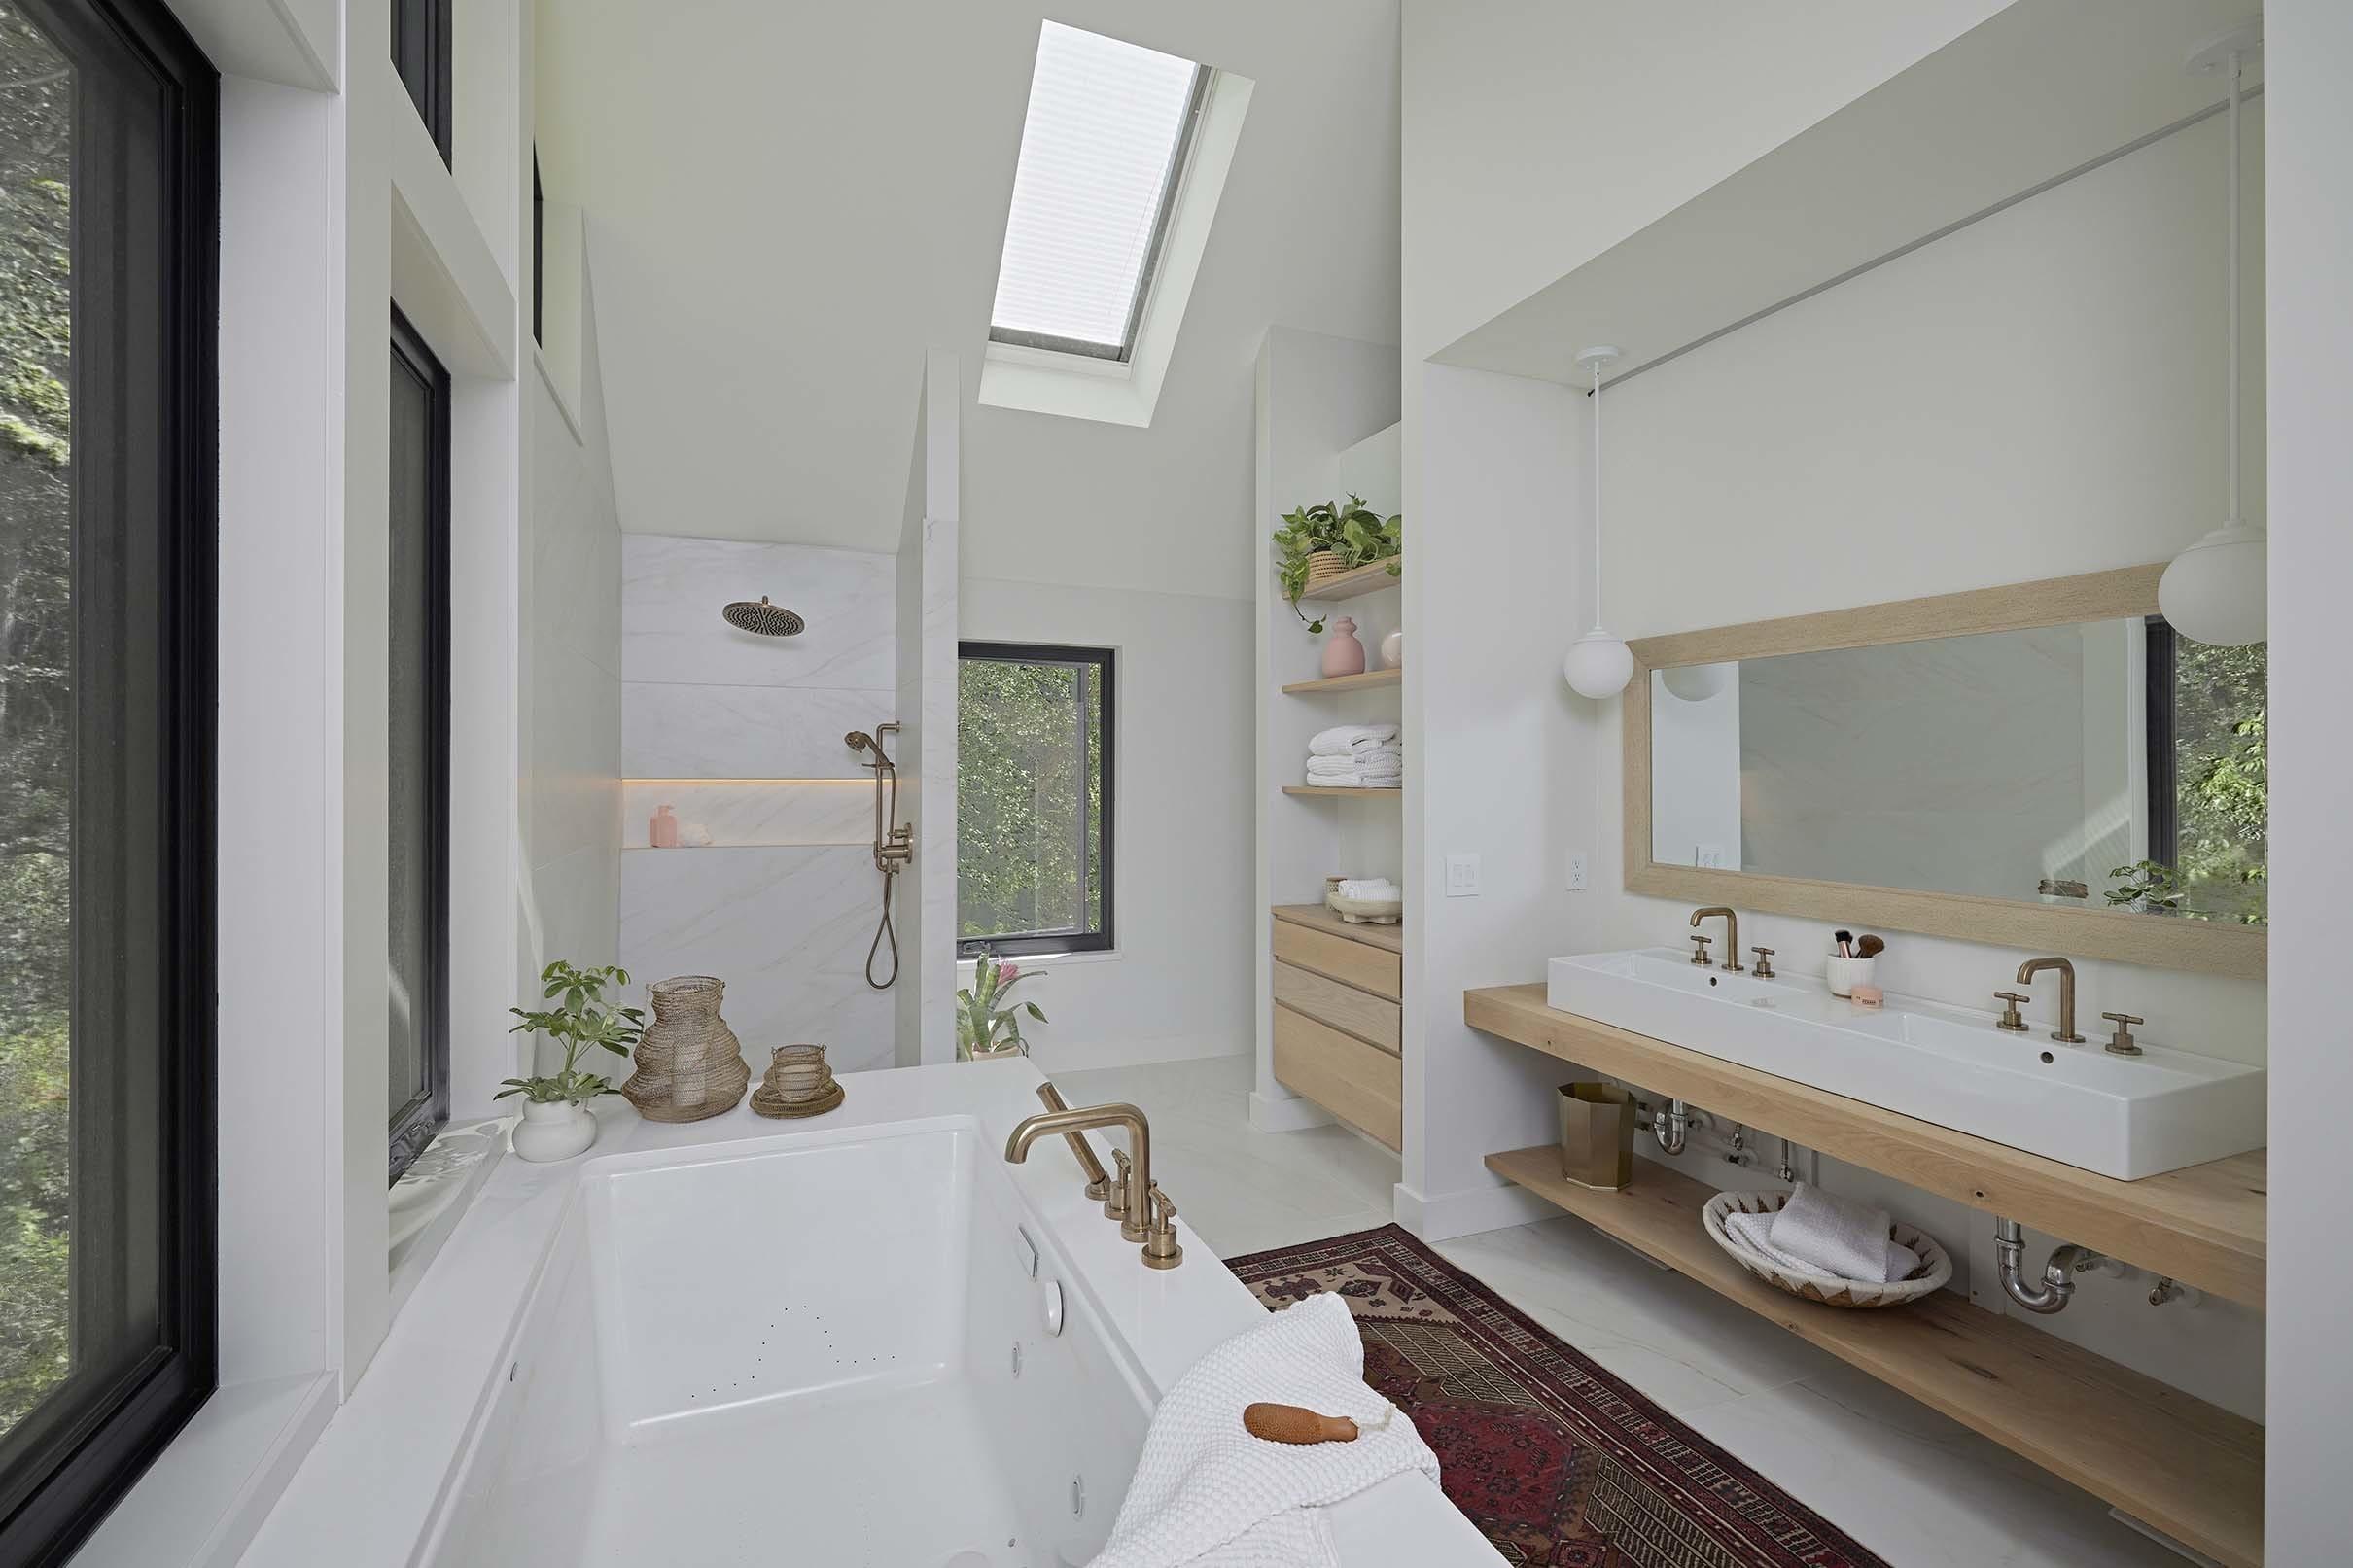 Bathroom skylight shades bathtub vanity mirror